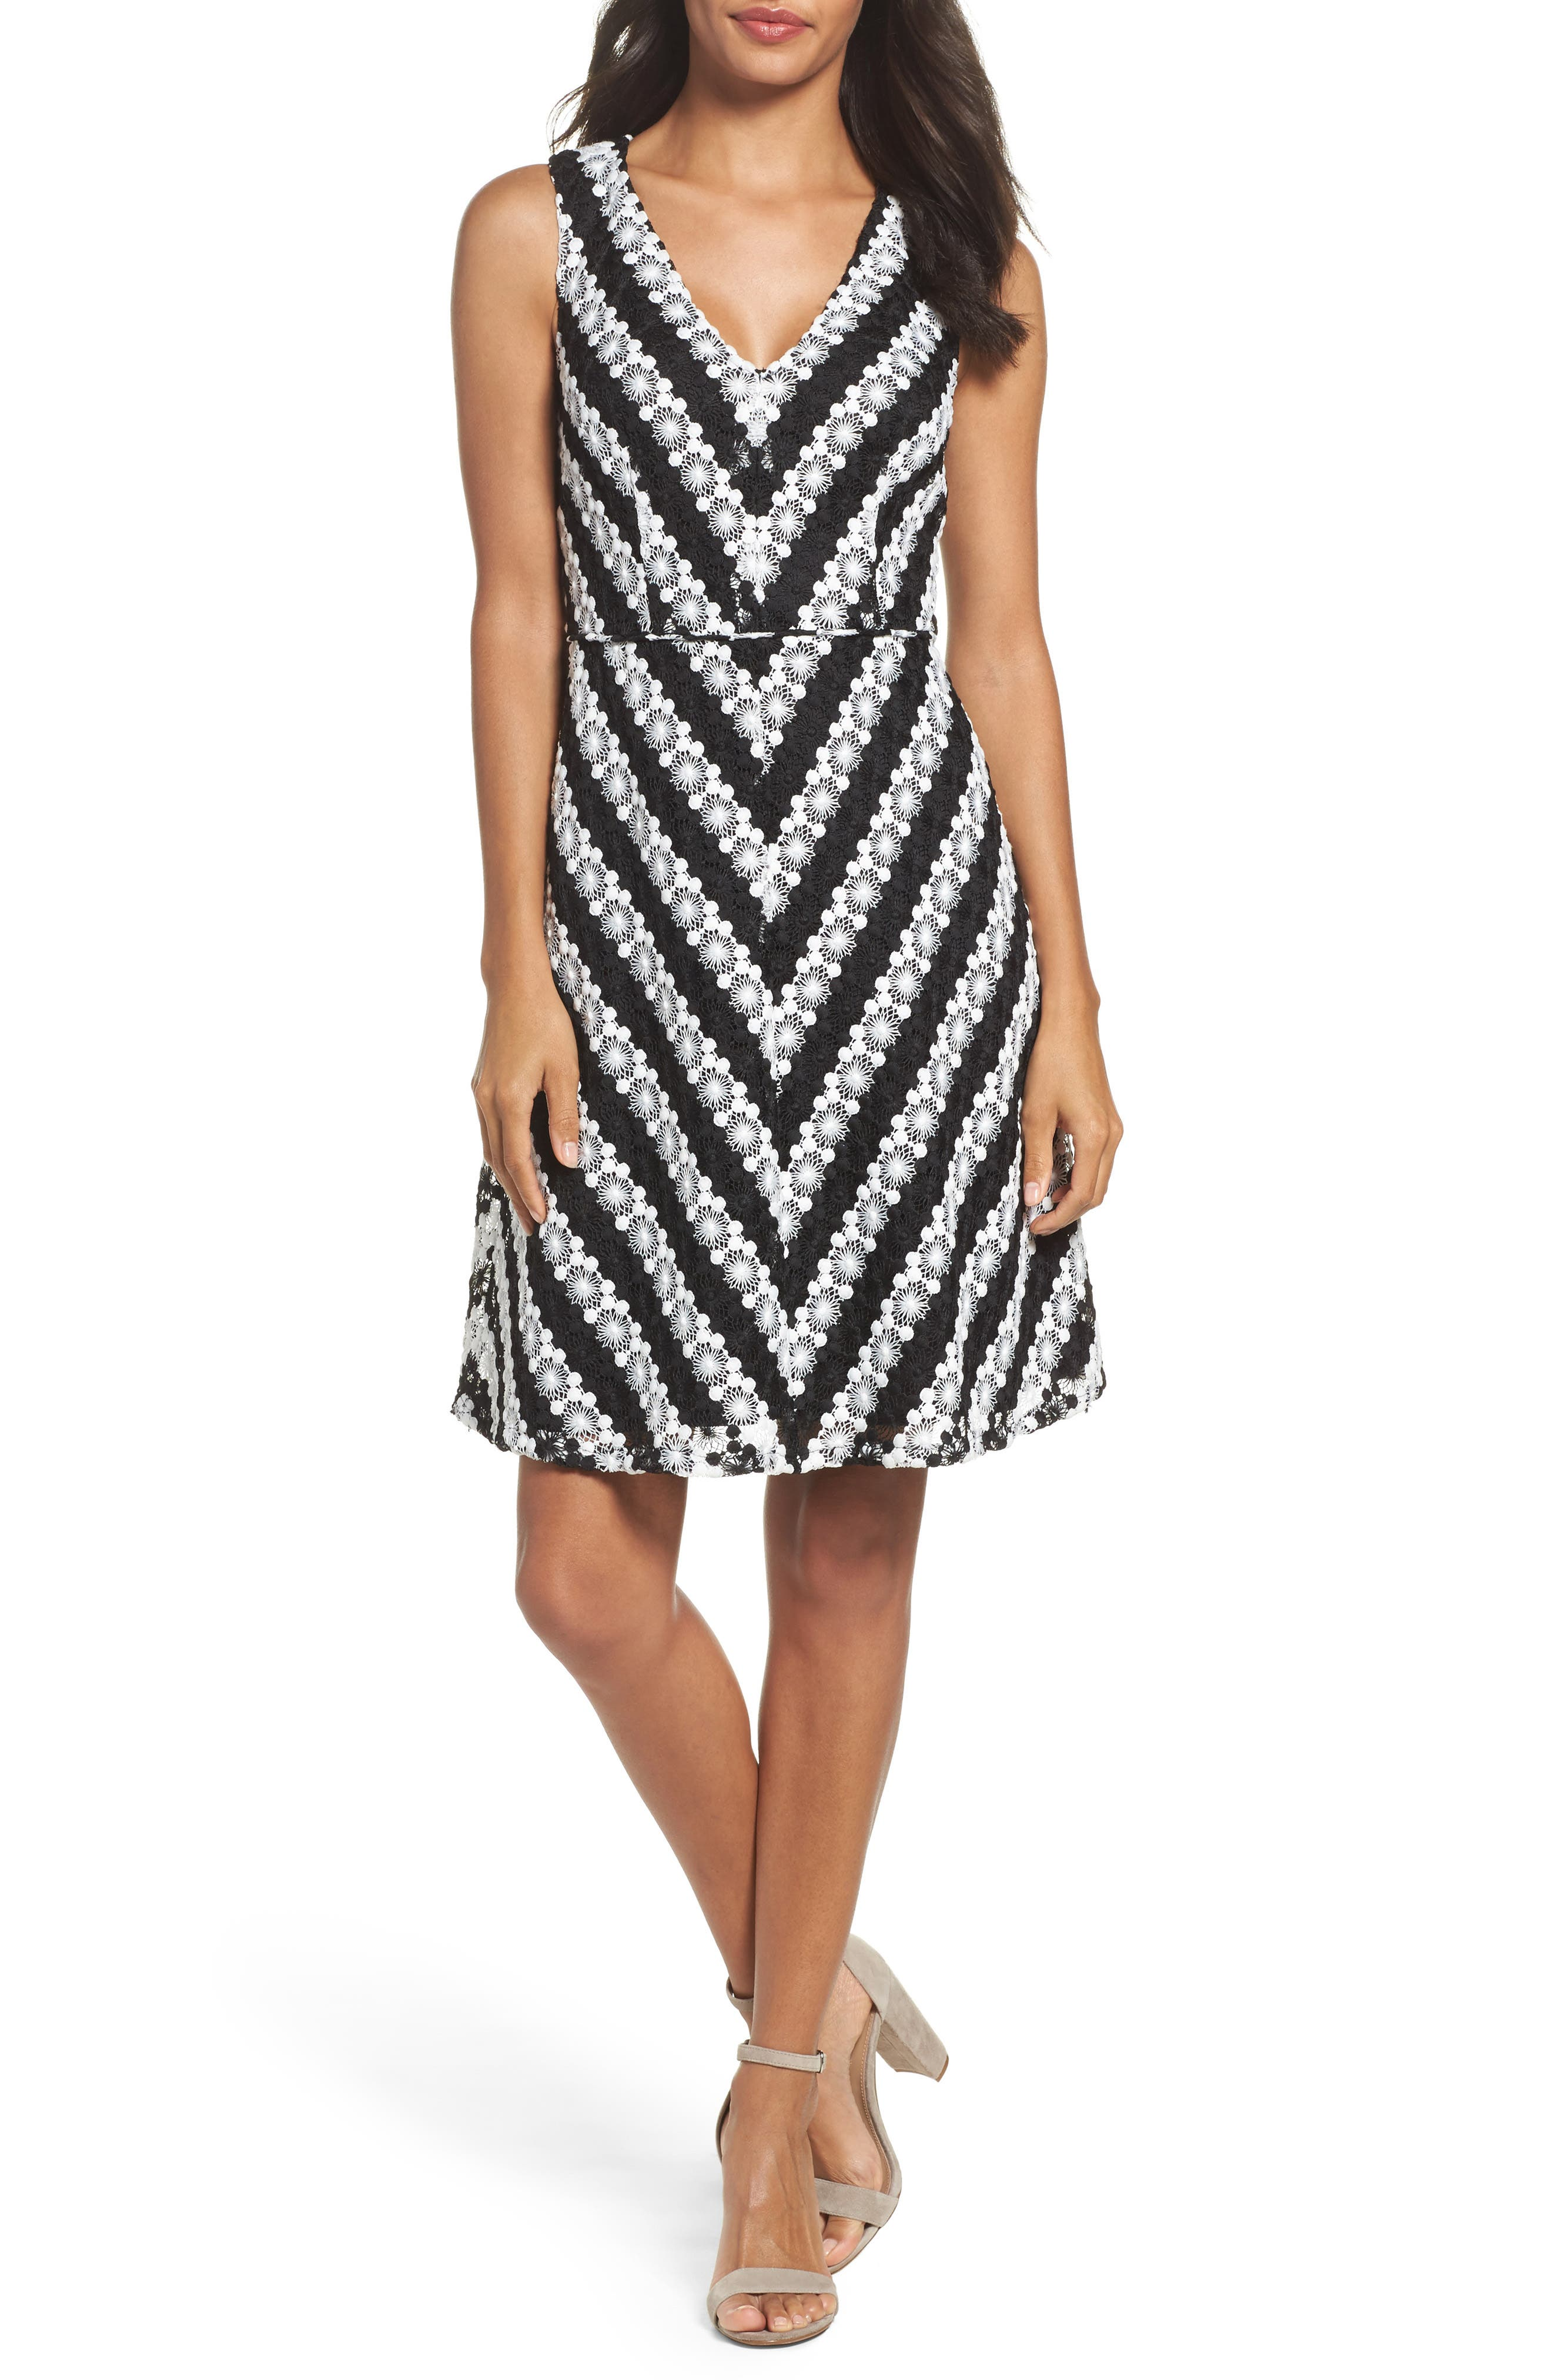 Main Image - Adrianna Papell Fit & Flare Dress (Regular & Petite)